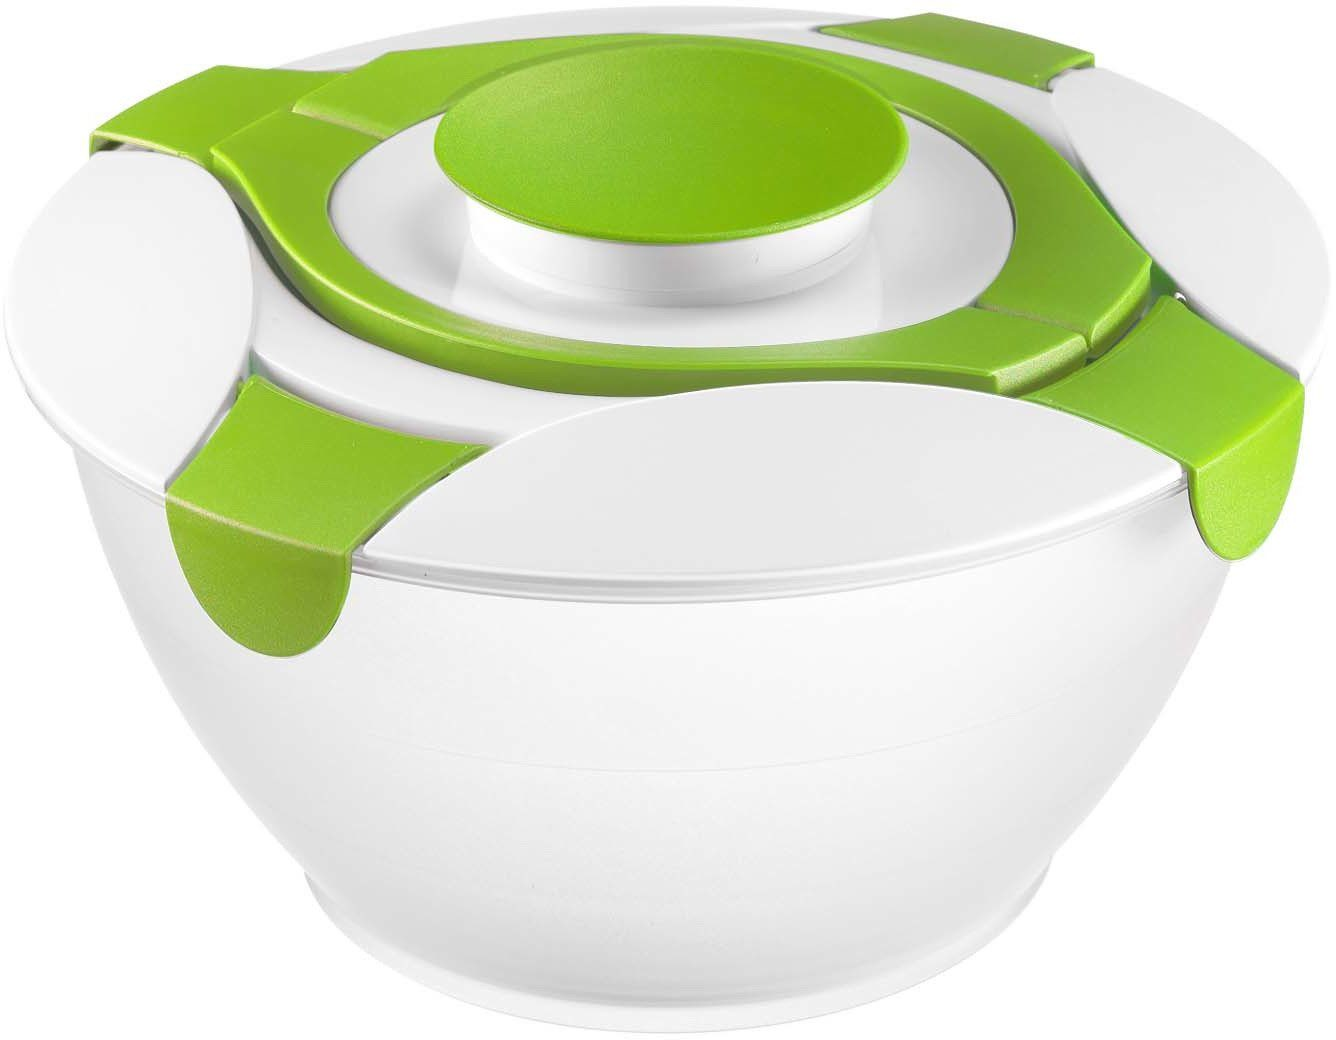 WESTMARK Salat-Set, 3-teilig